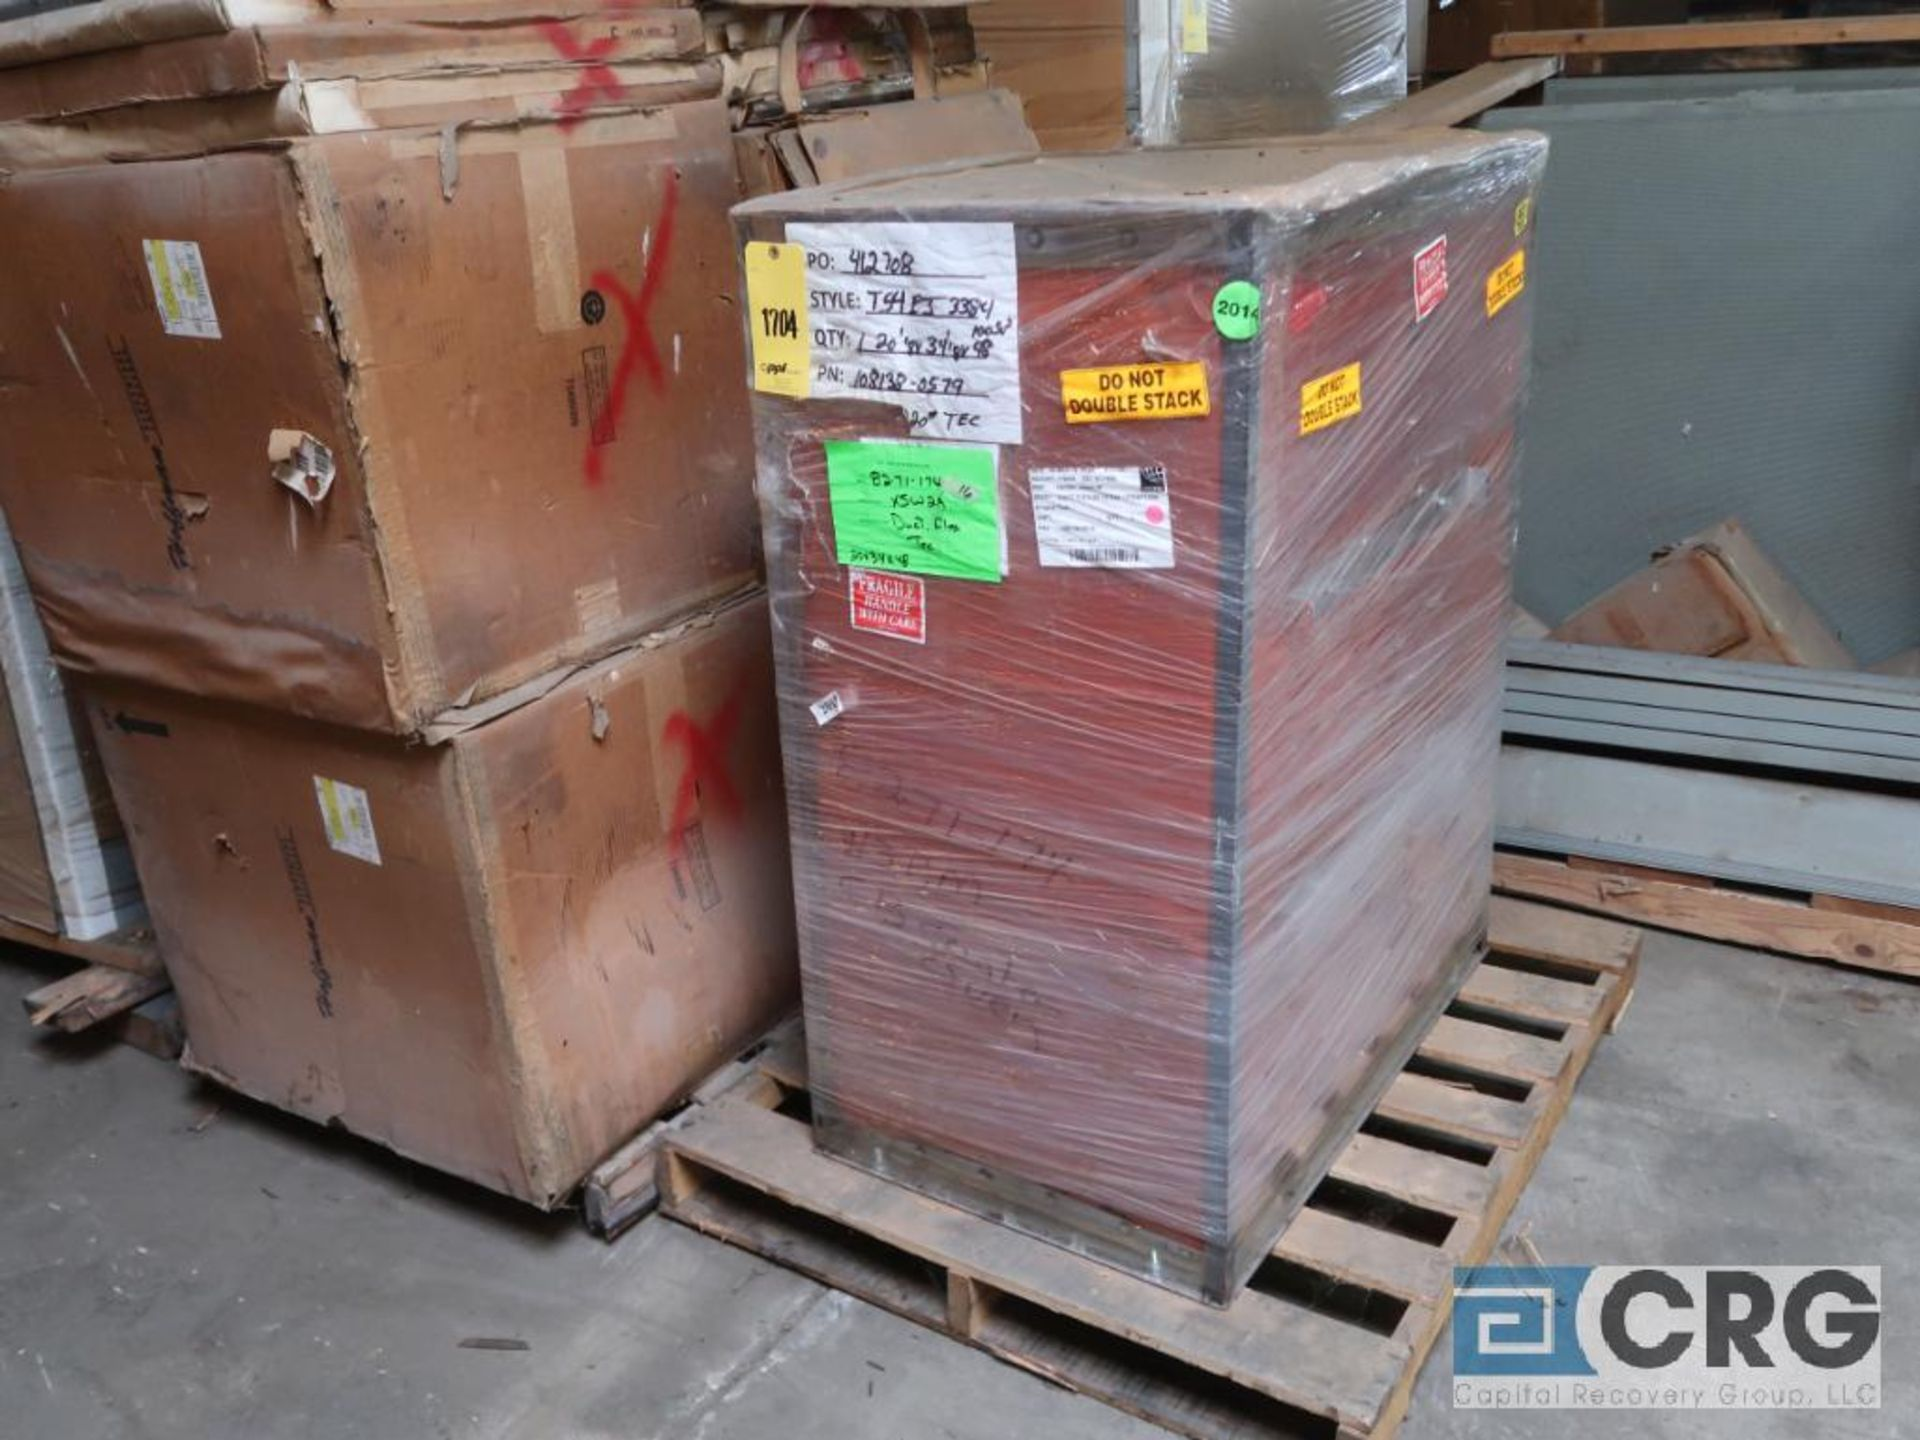 Uniclad 2000 KVA dry type transformer, 3 ph., HV 22860, BIL .125 KV, LV 480 GRDY/277 BIL. 10 KV, (5) - Image 3 of 4